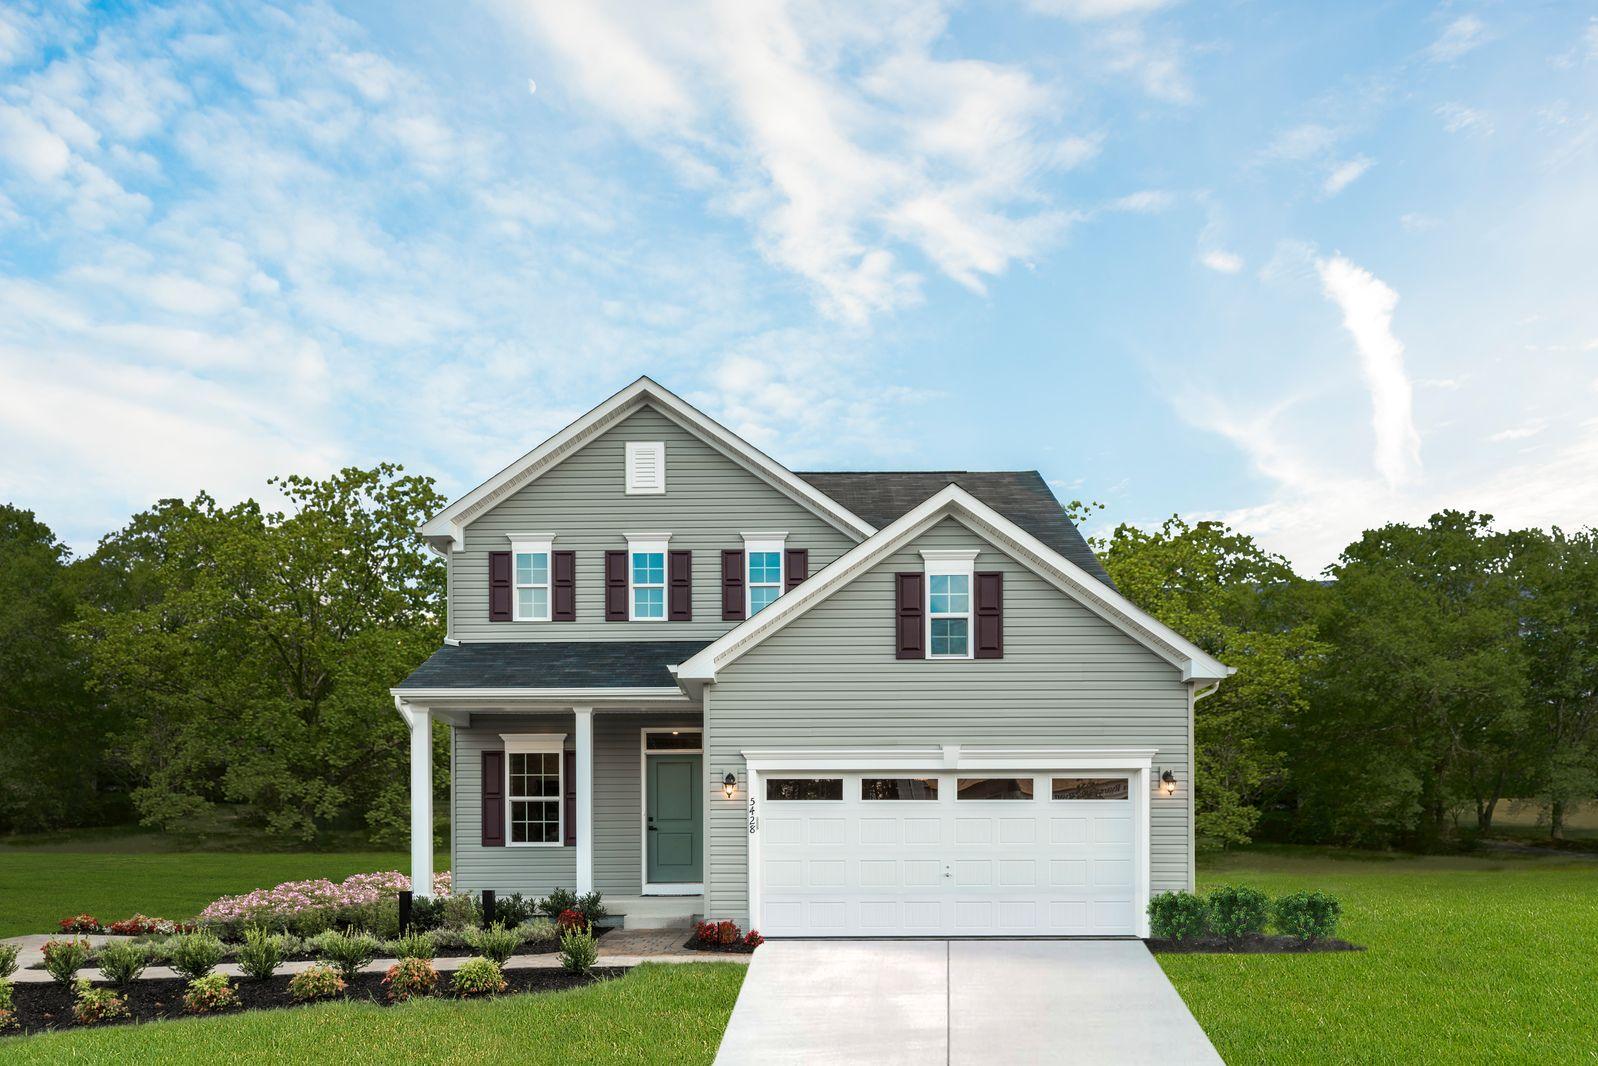 Single Family for Sale at May's Quarter - Ballenger 12420 May's Quarter Road Lake Ridge, Virginia 22192 United States